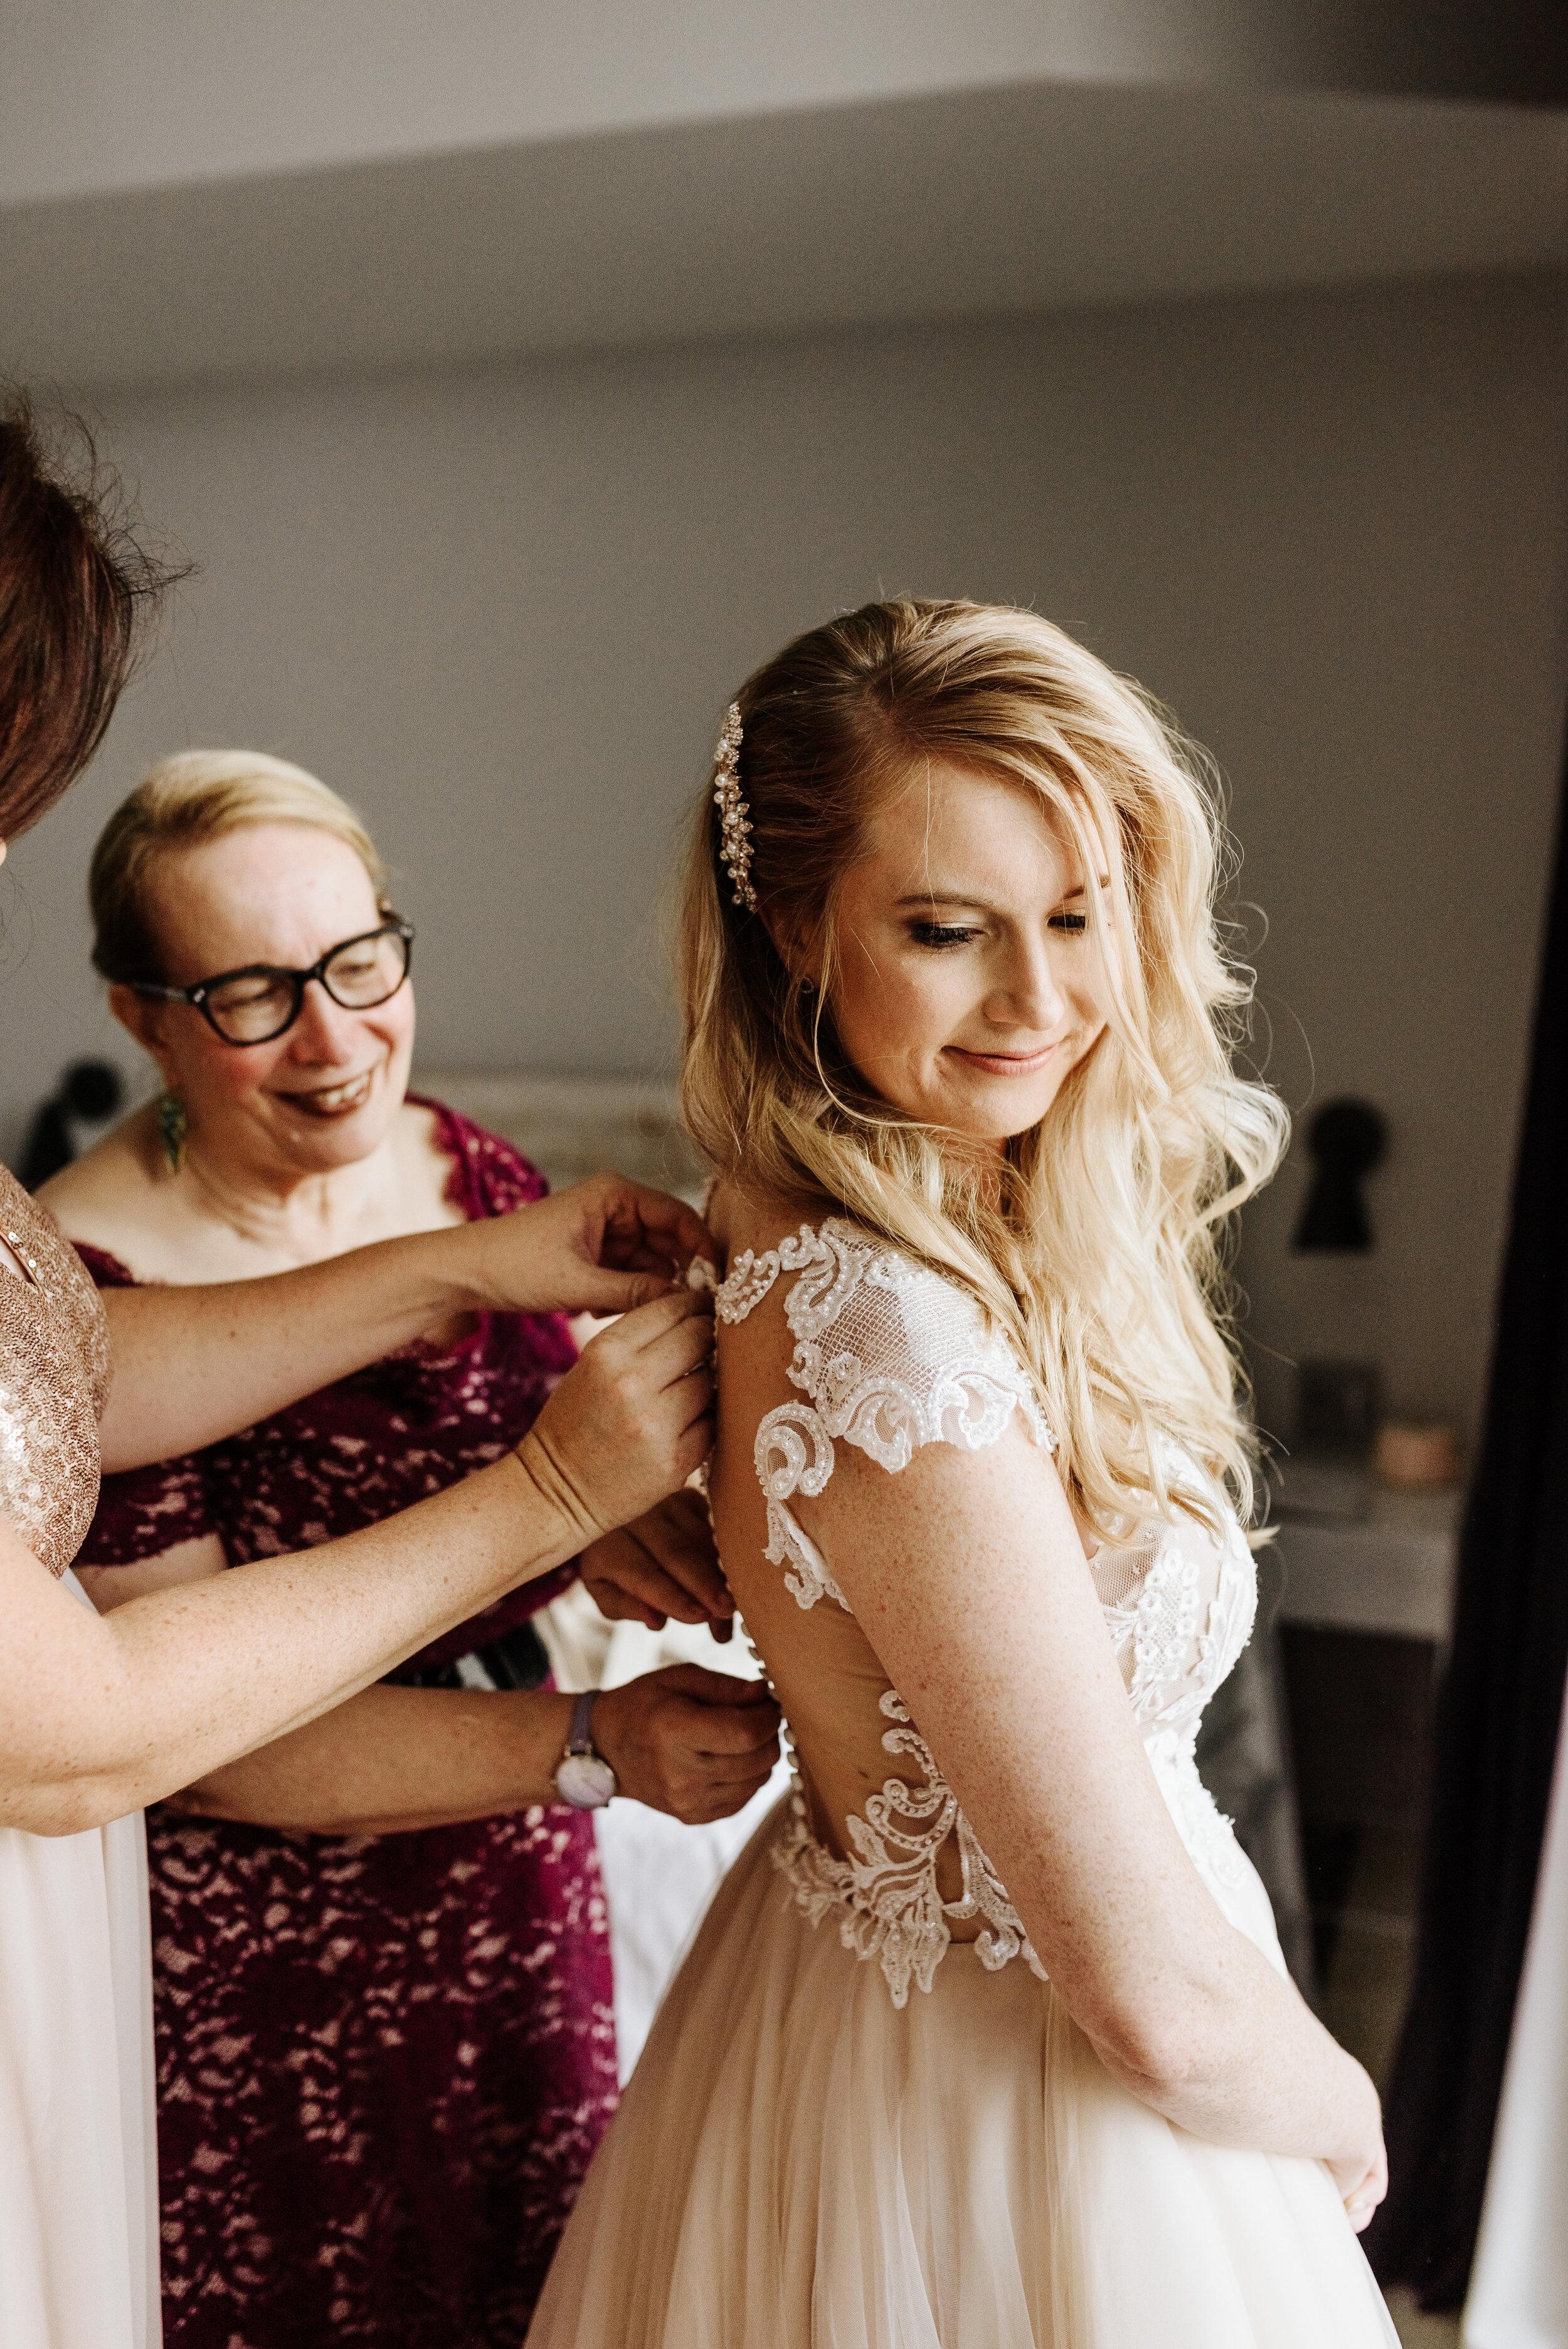 Cassie-Mrunal-Wedding-Quirk-Hotel-John-Marshall-Ballrooms-Richmond-Virginia-Photography-by-V-13.jpg